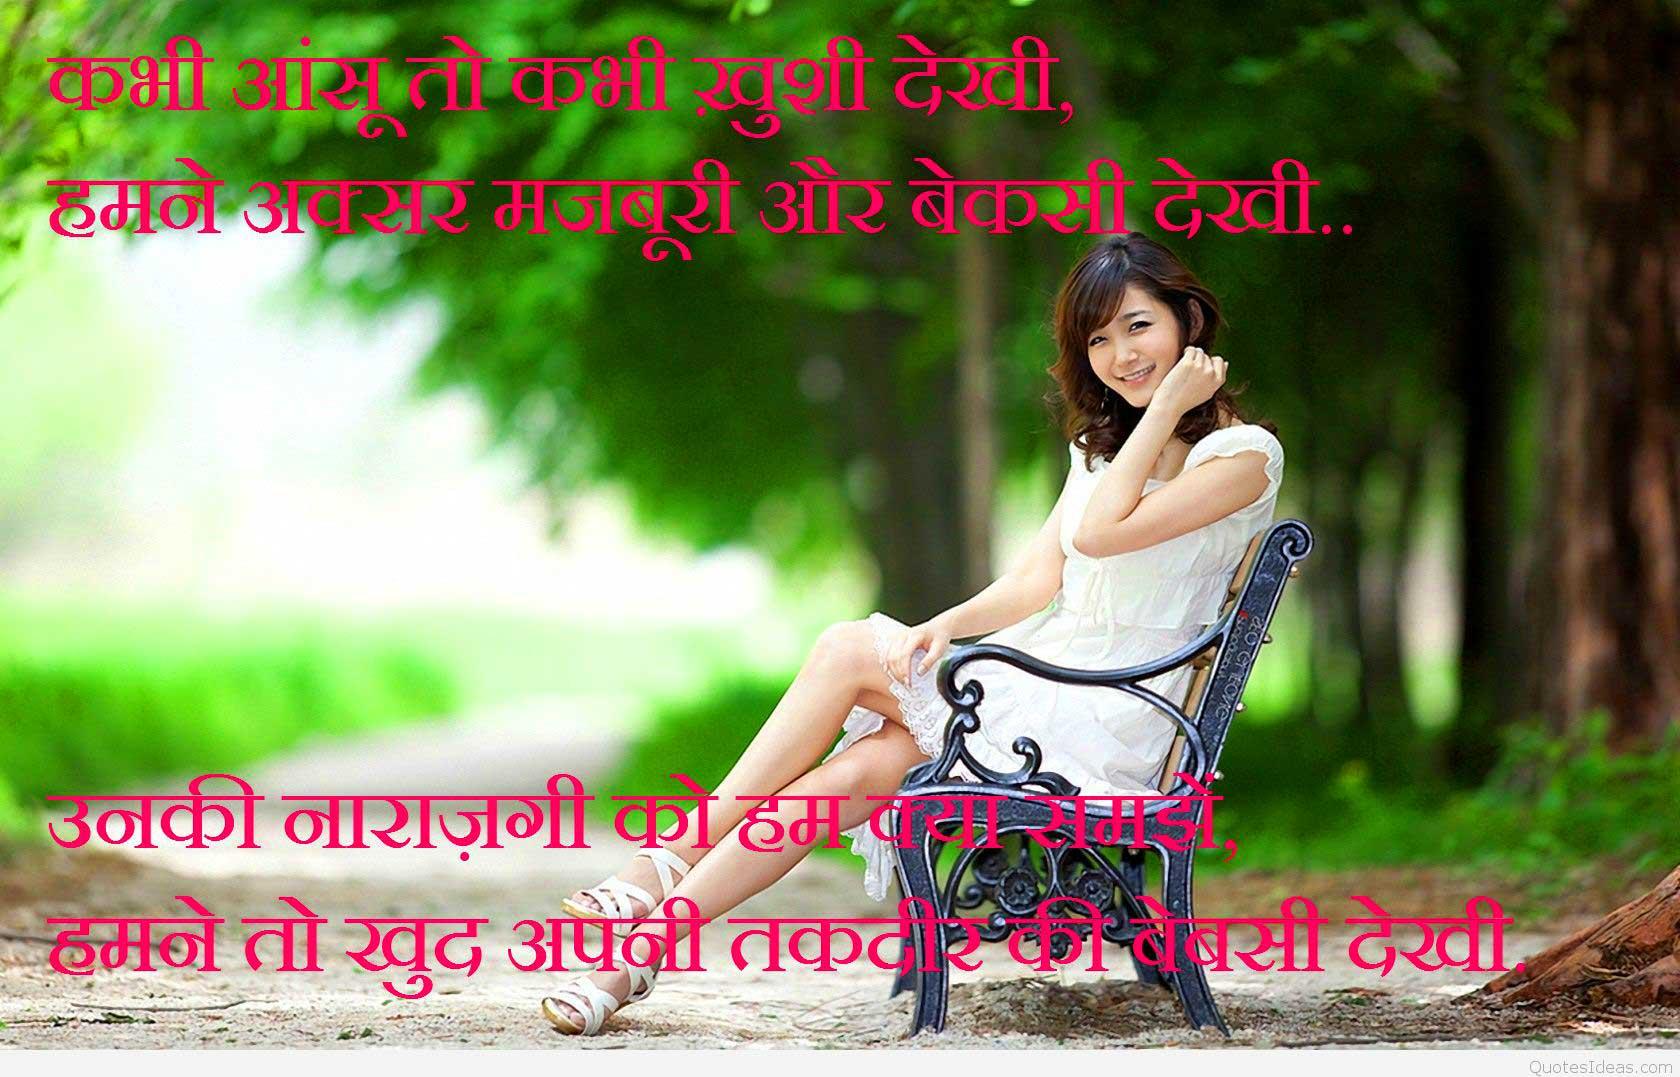 311+ Love Whatsapp Status Images In Hindi - 6100+ Good ...